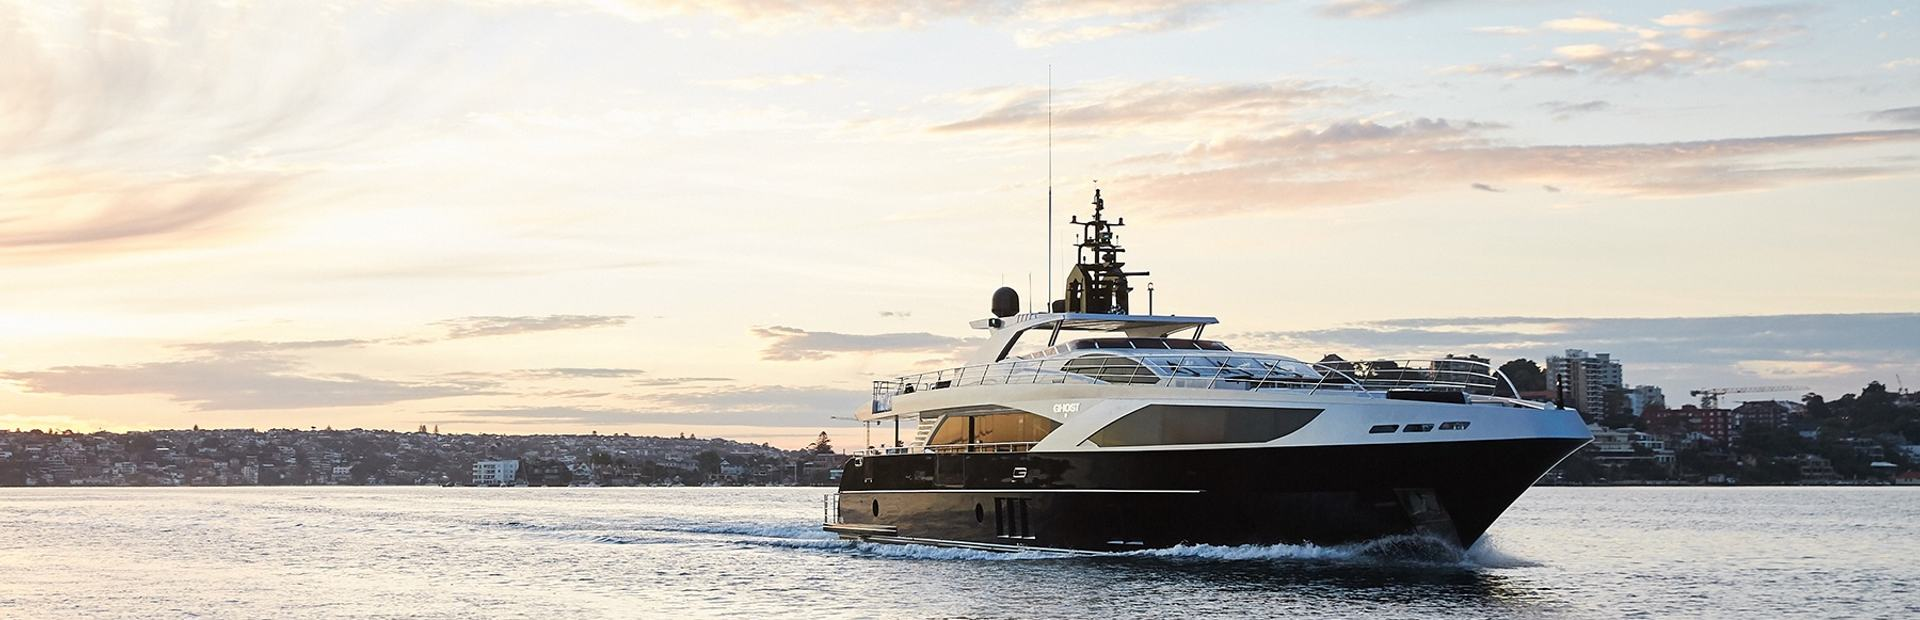 Majesty 122 Yacht Charter